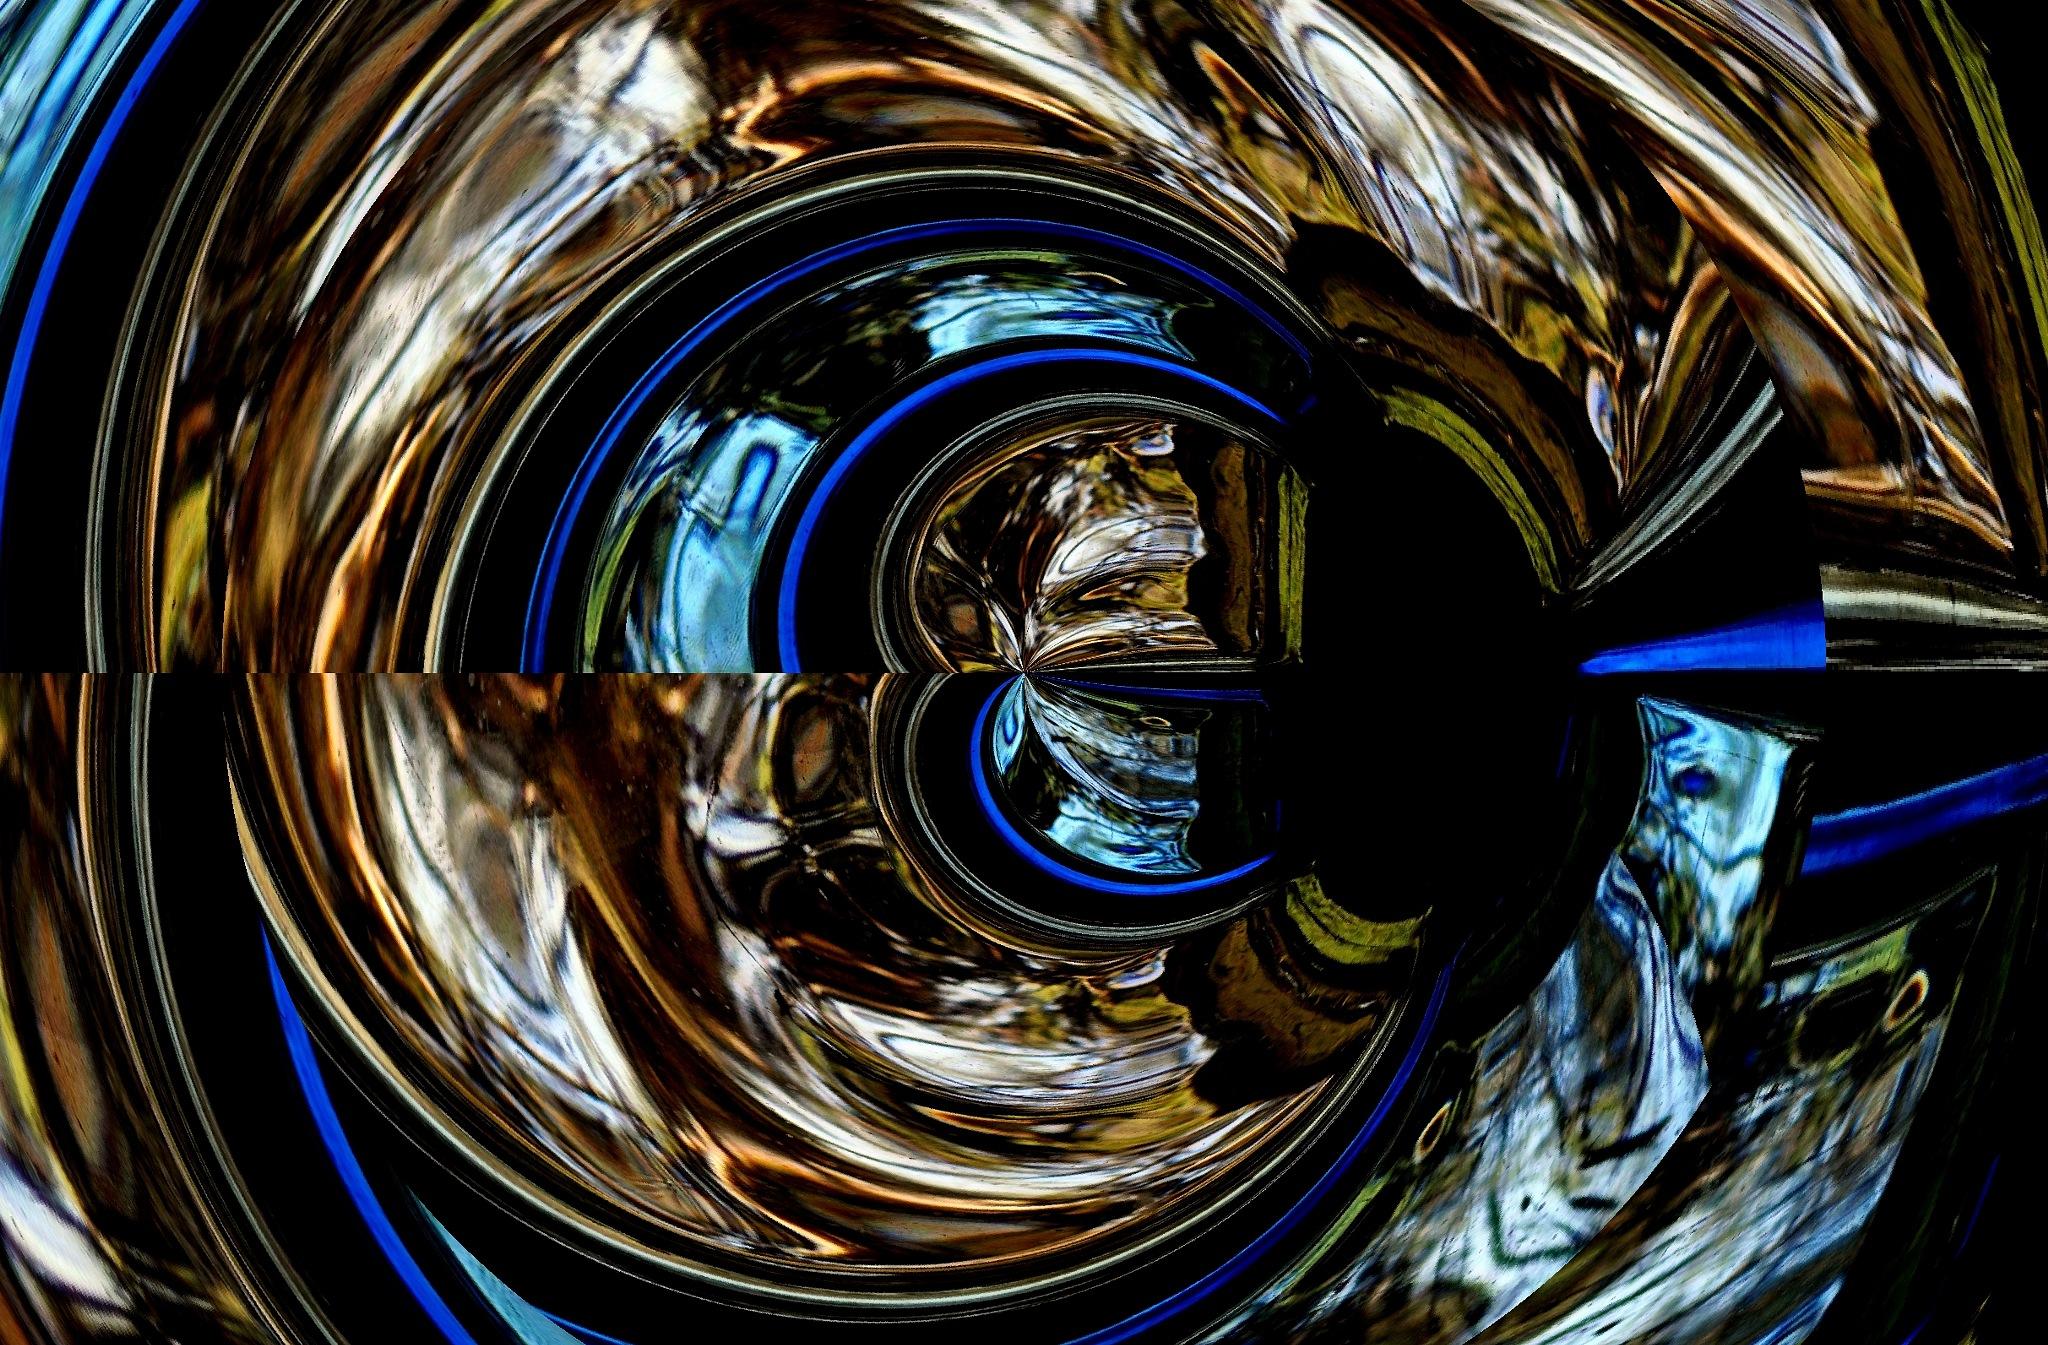 Photo abstracta by José Evaldo Suassuna de Oliveira